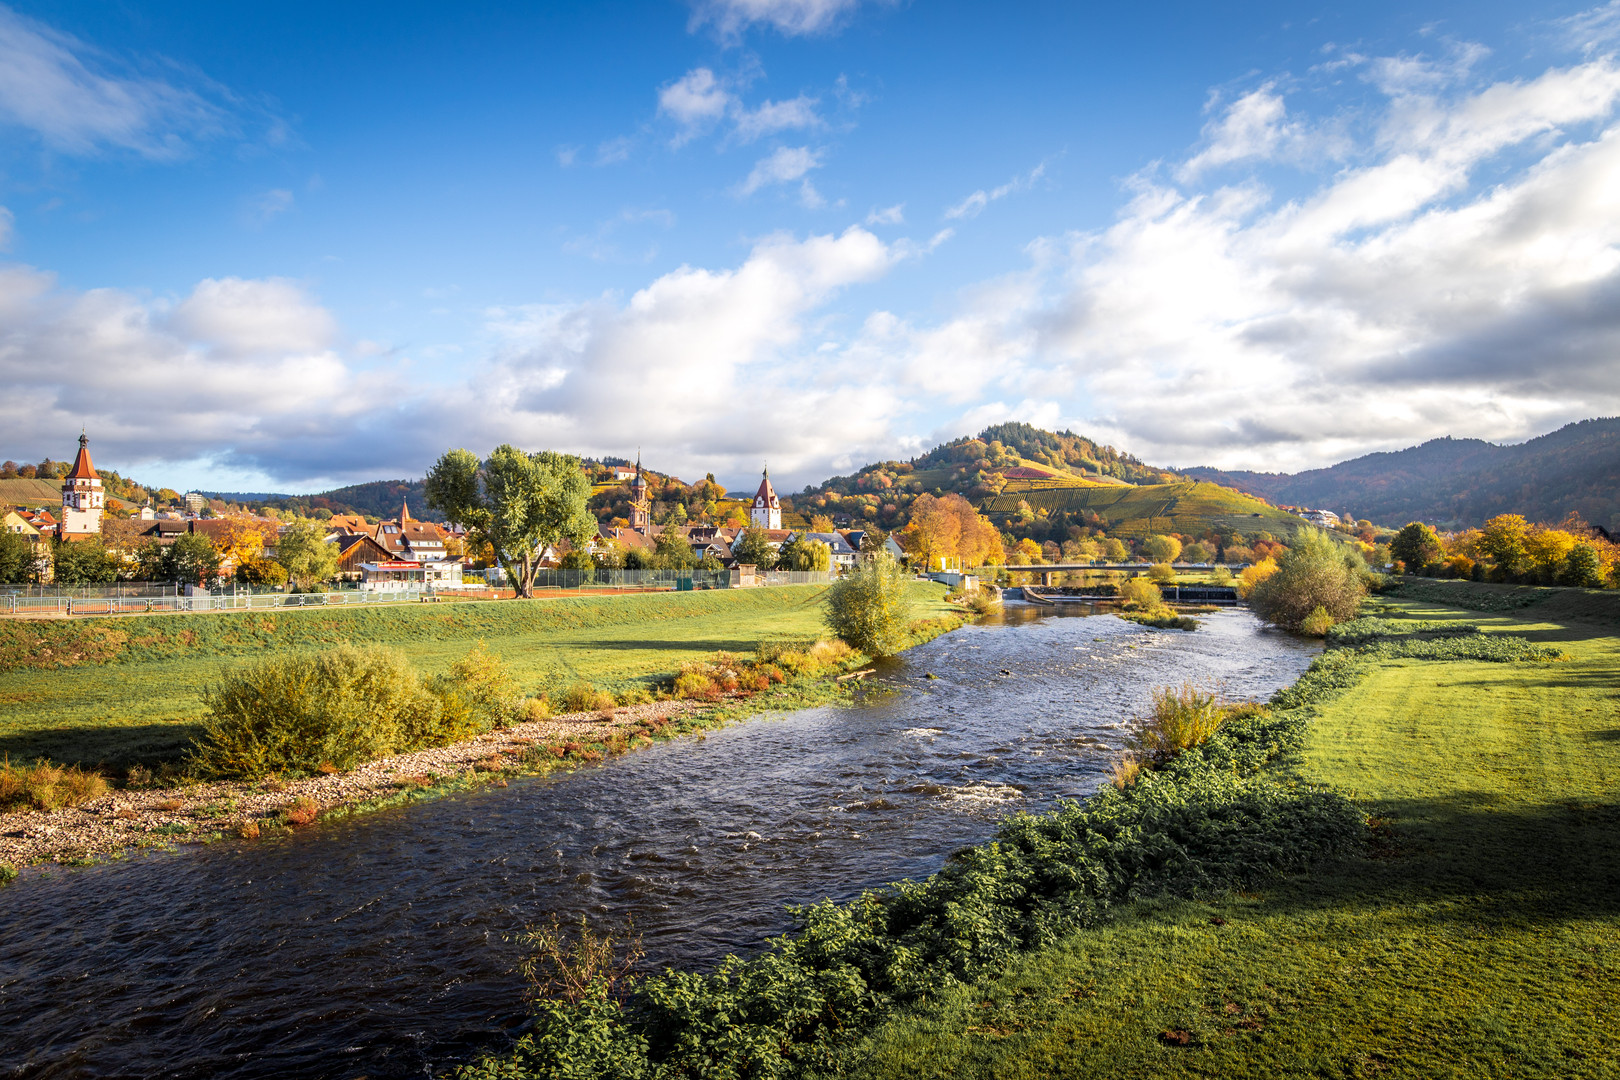 Autumn in Gengenbach